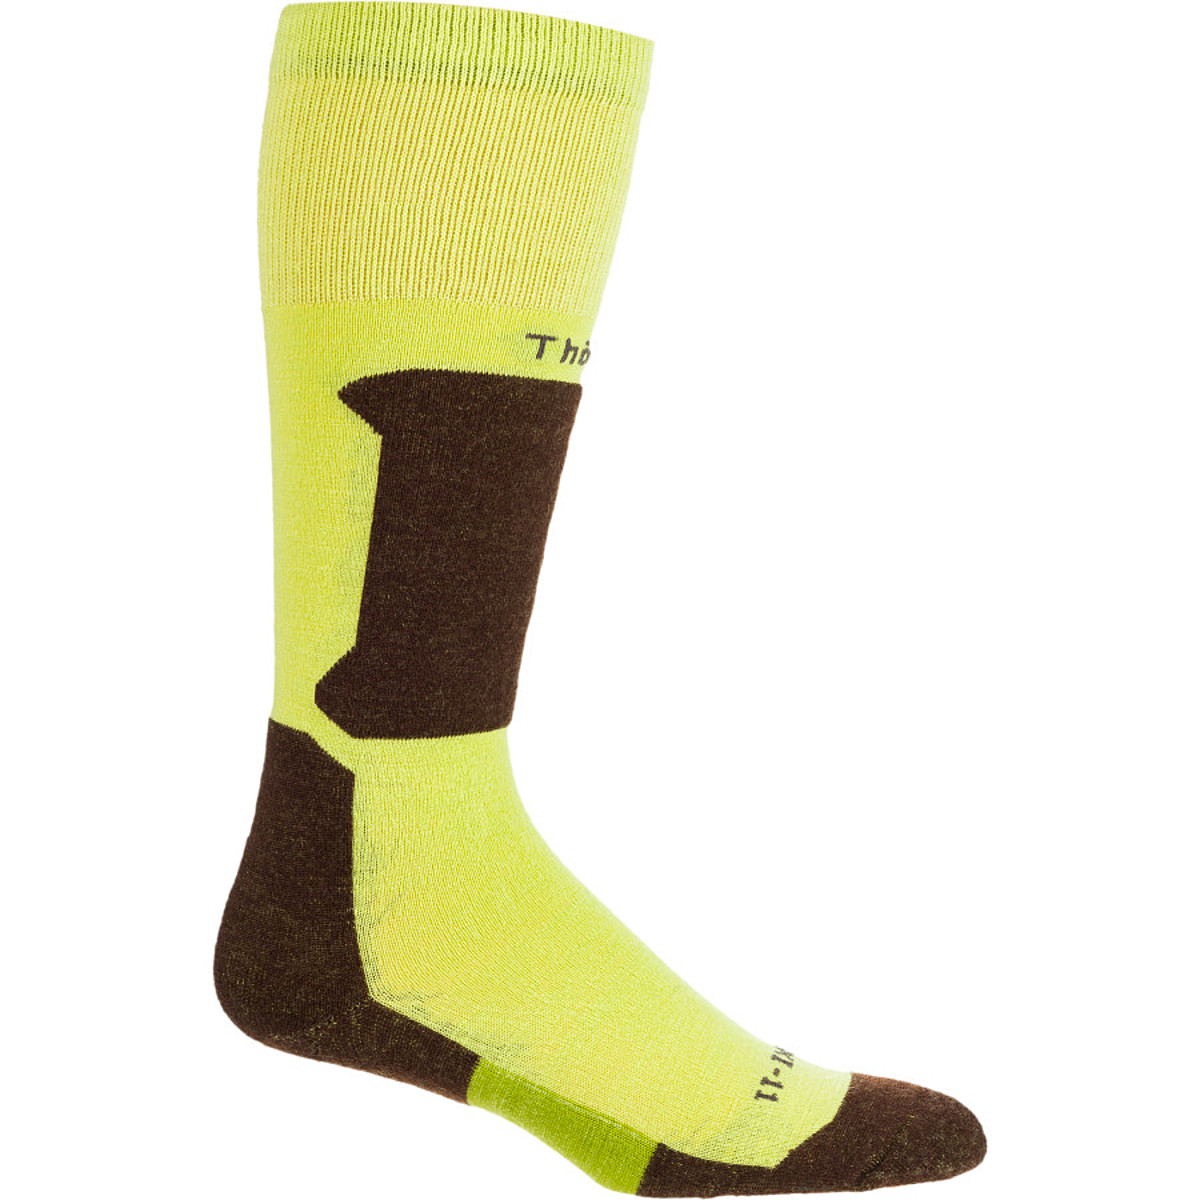 Thorlo eXtreme Ski Sock - Thin Cushion